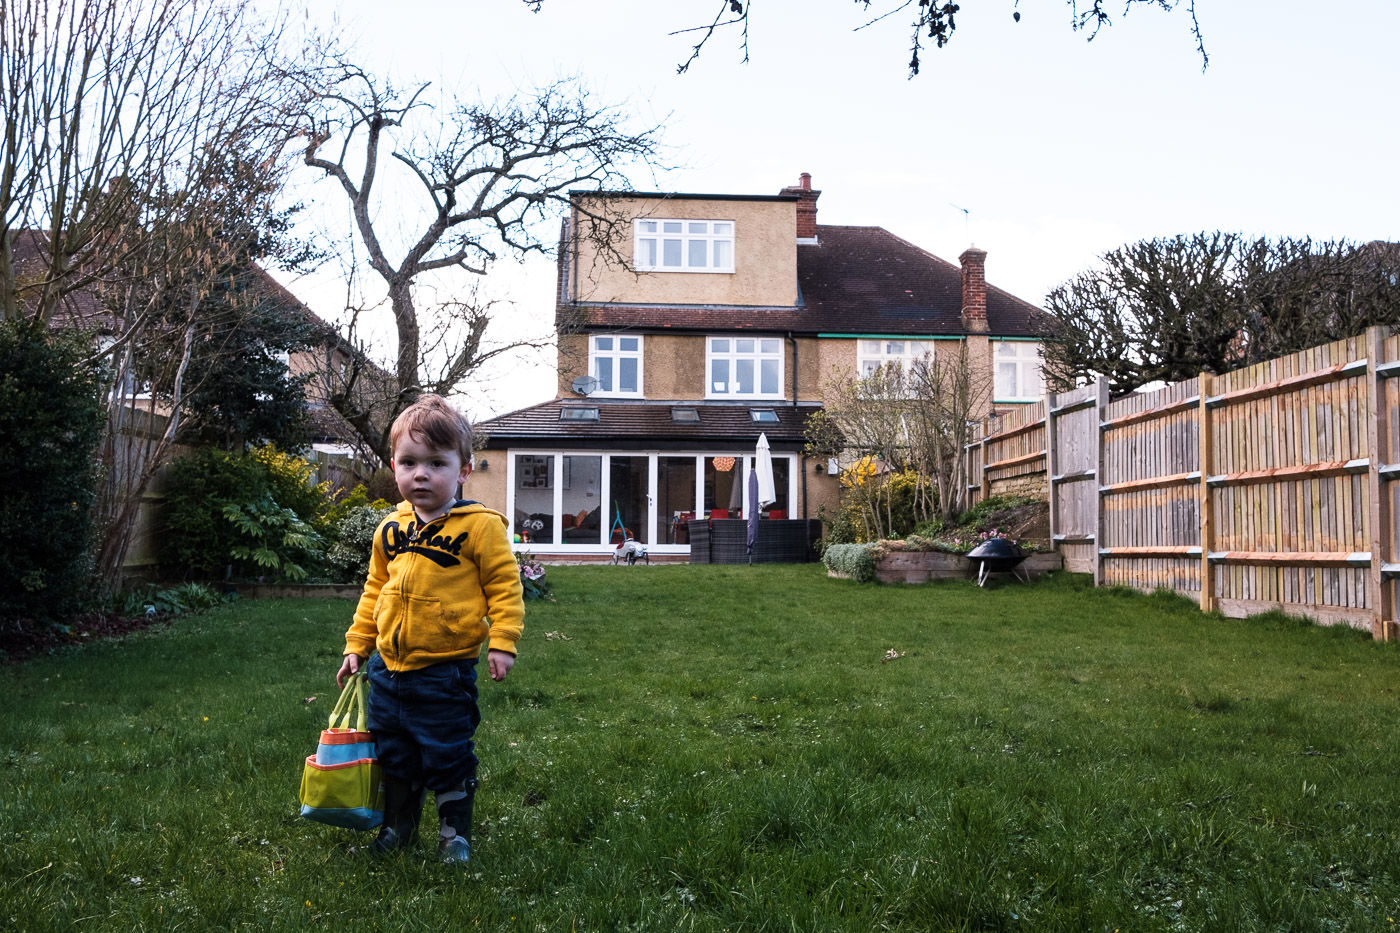 Environmental portrait of a boy in the garden